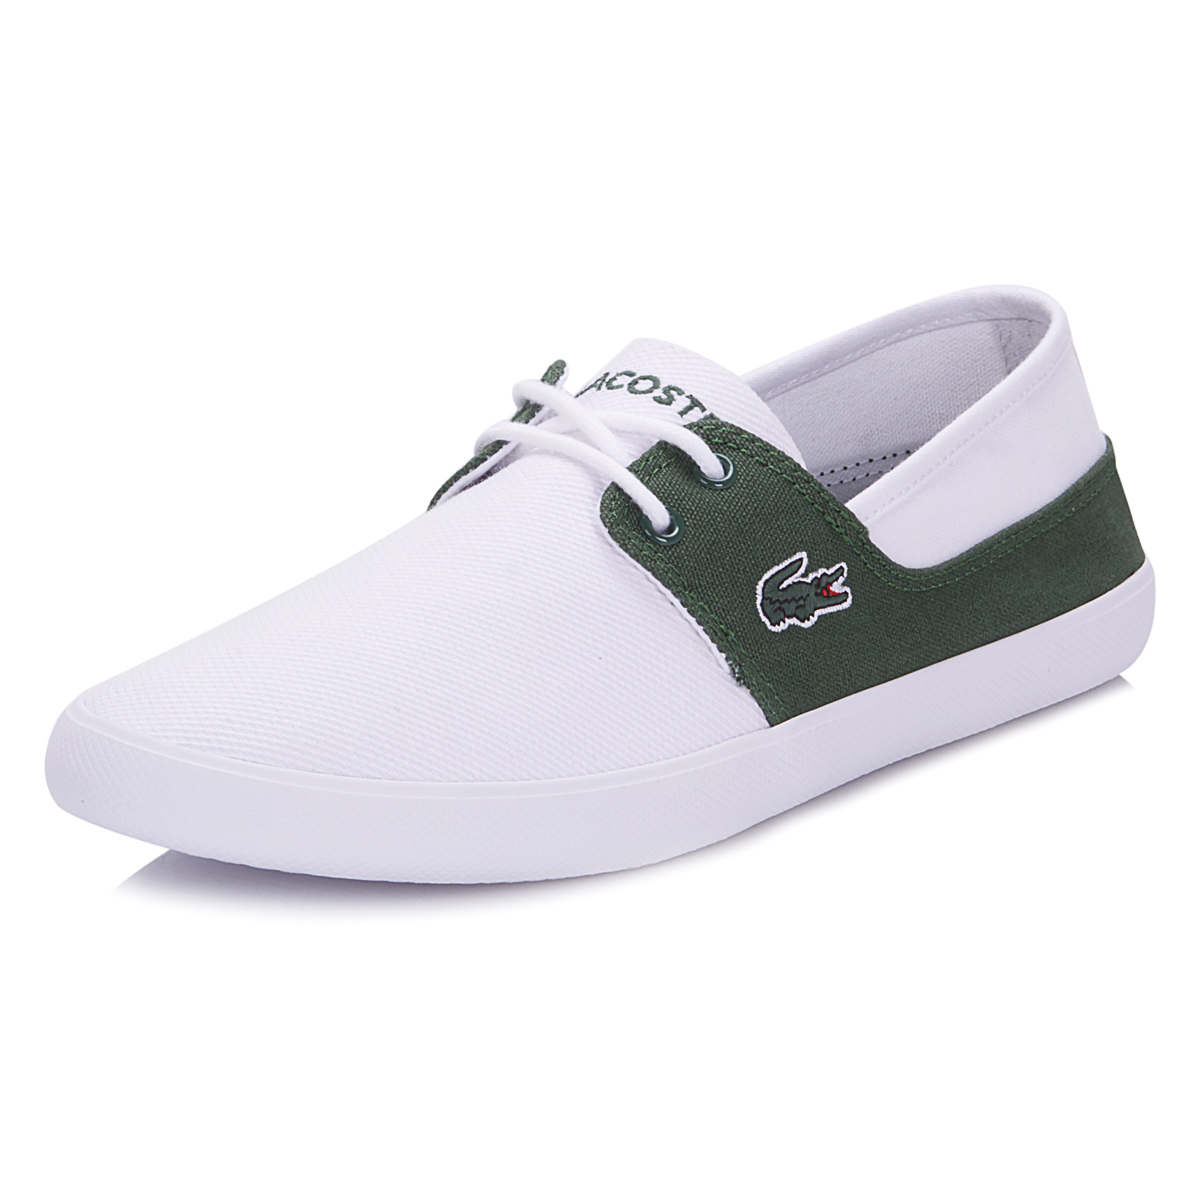 Lacoste Shoes Marice Lace